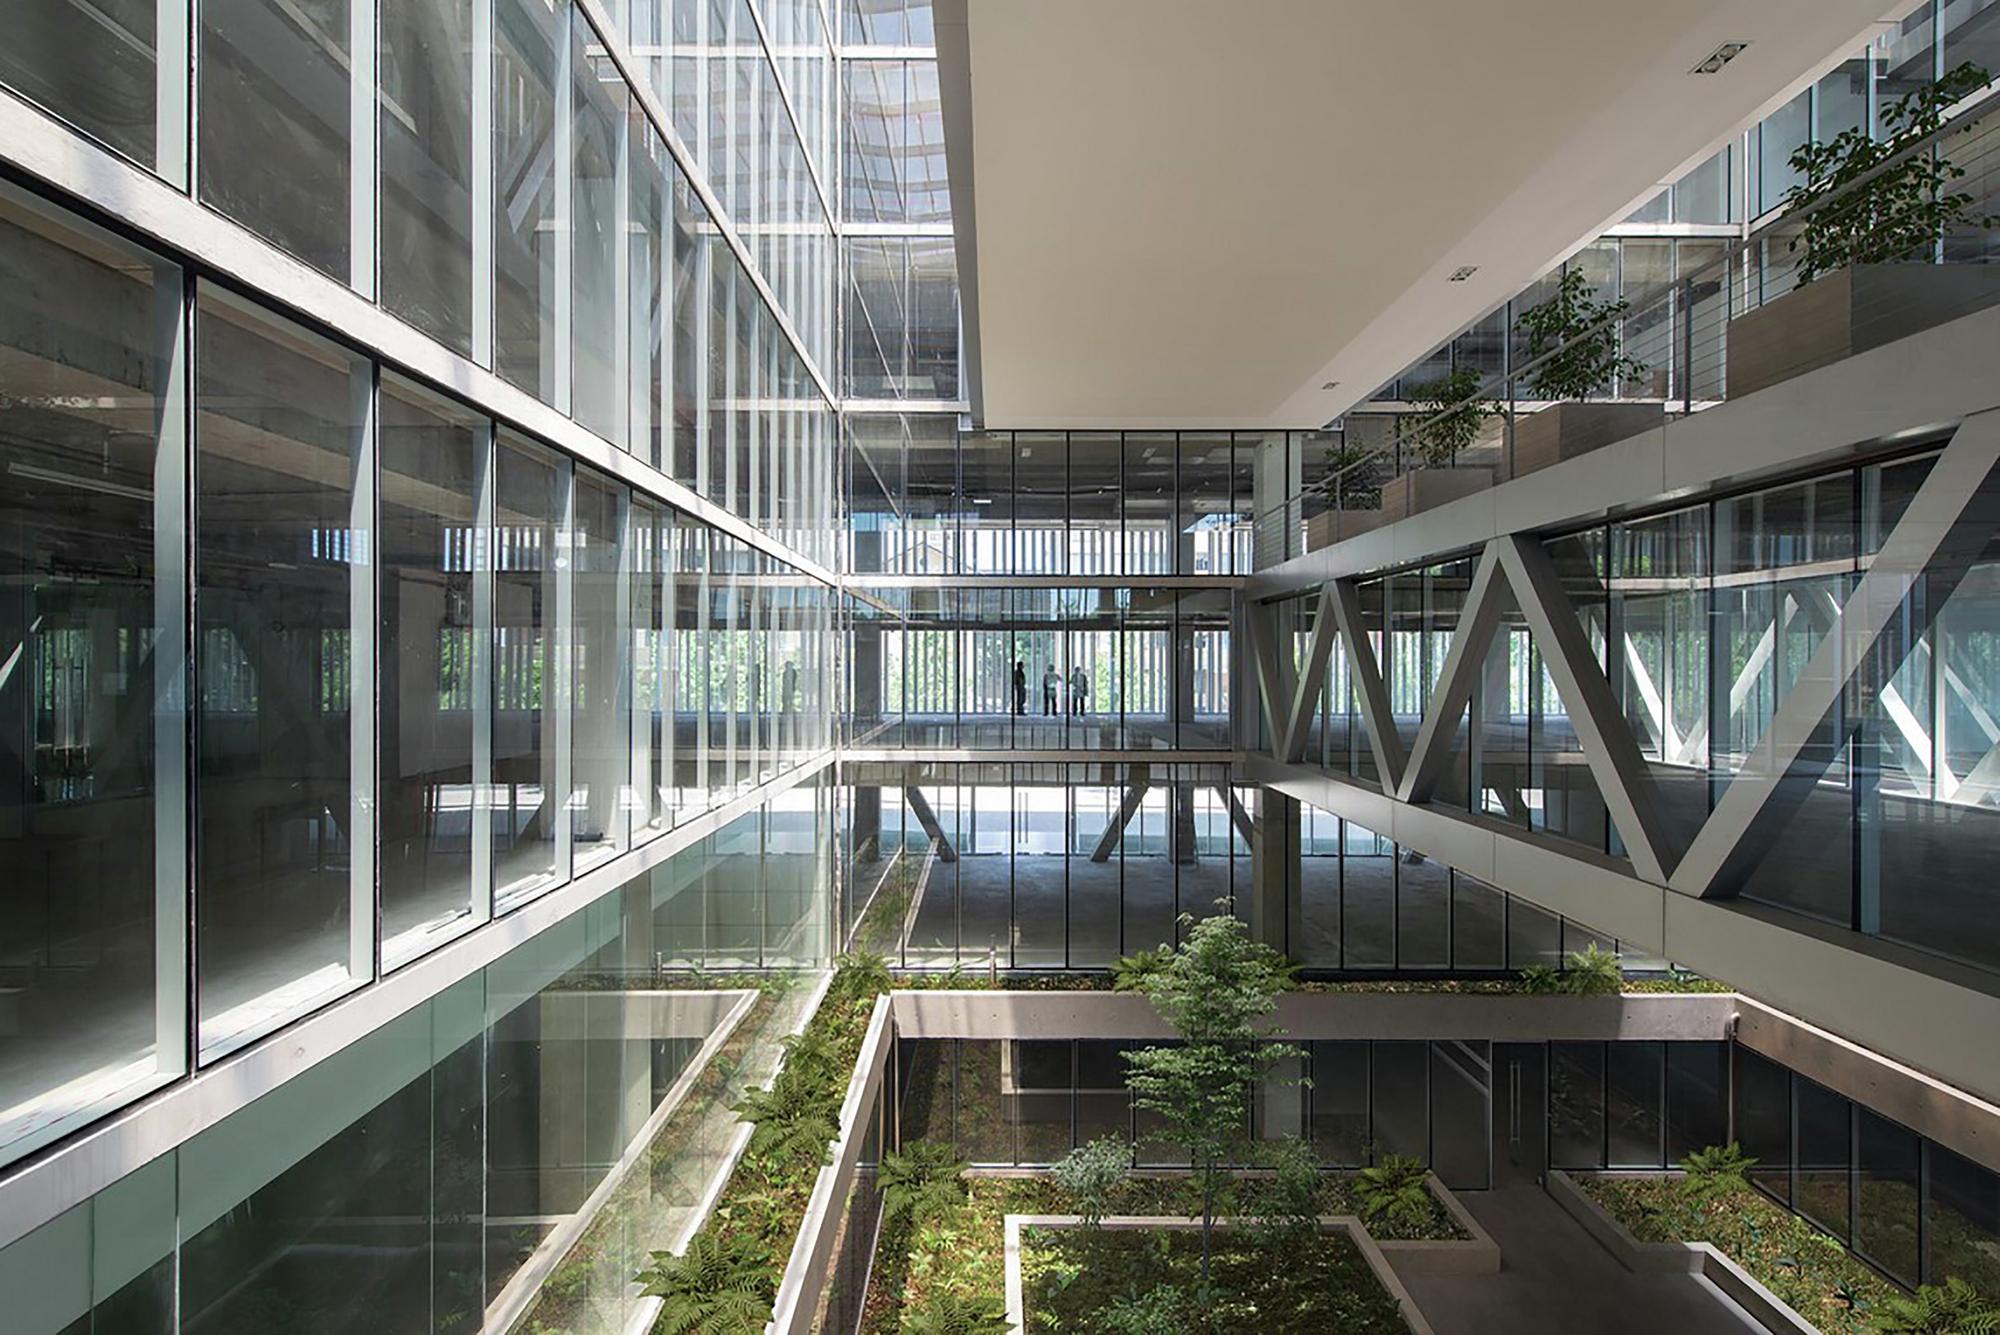 Edificio santa ana undurraga dev s arquitectos for Arquitectura de interiores universidades